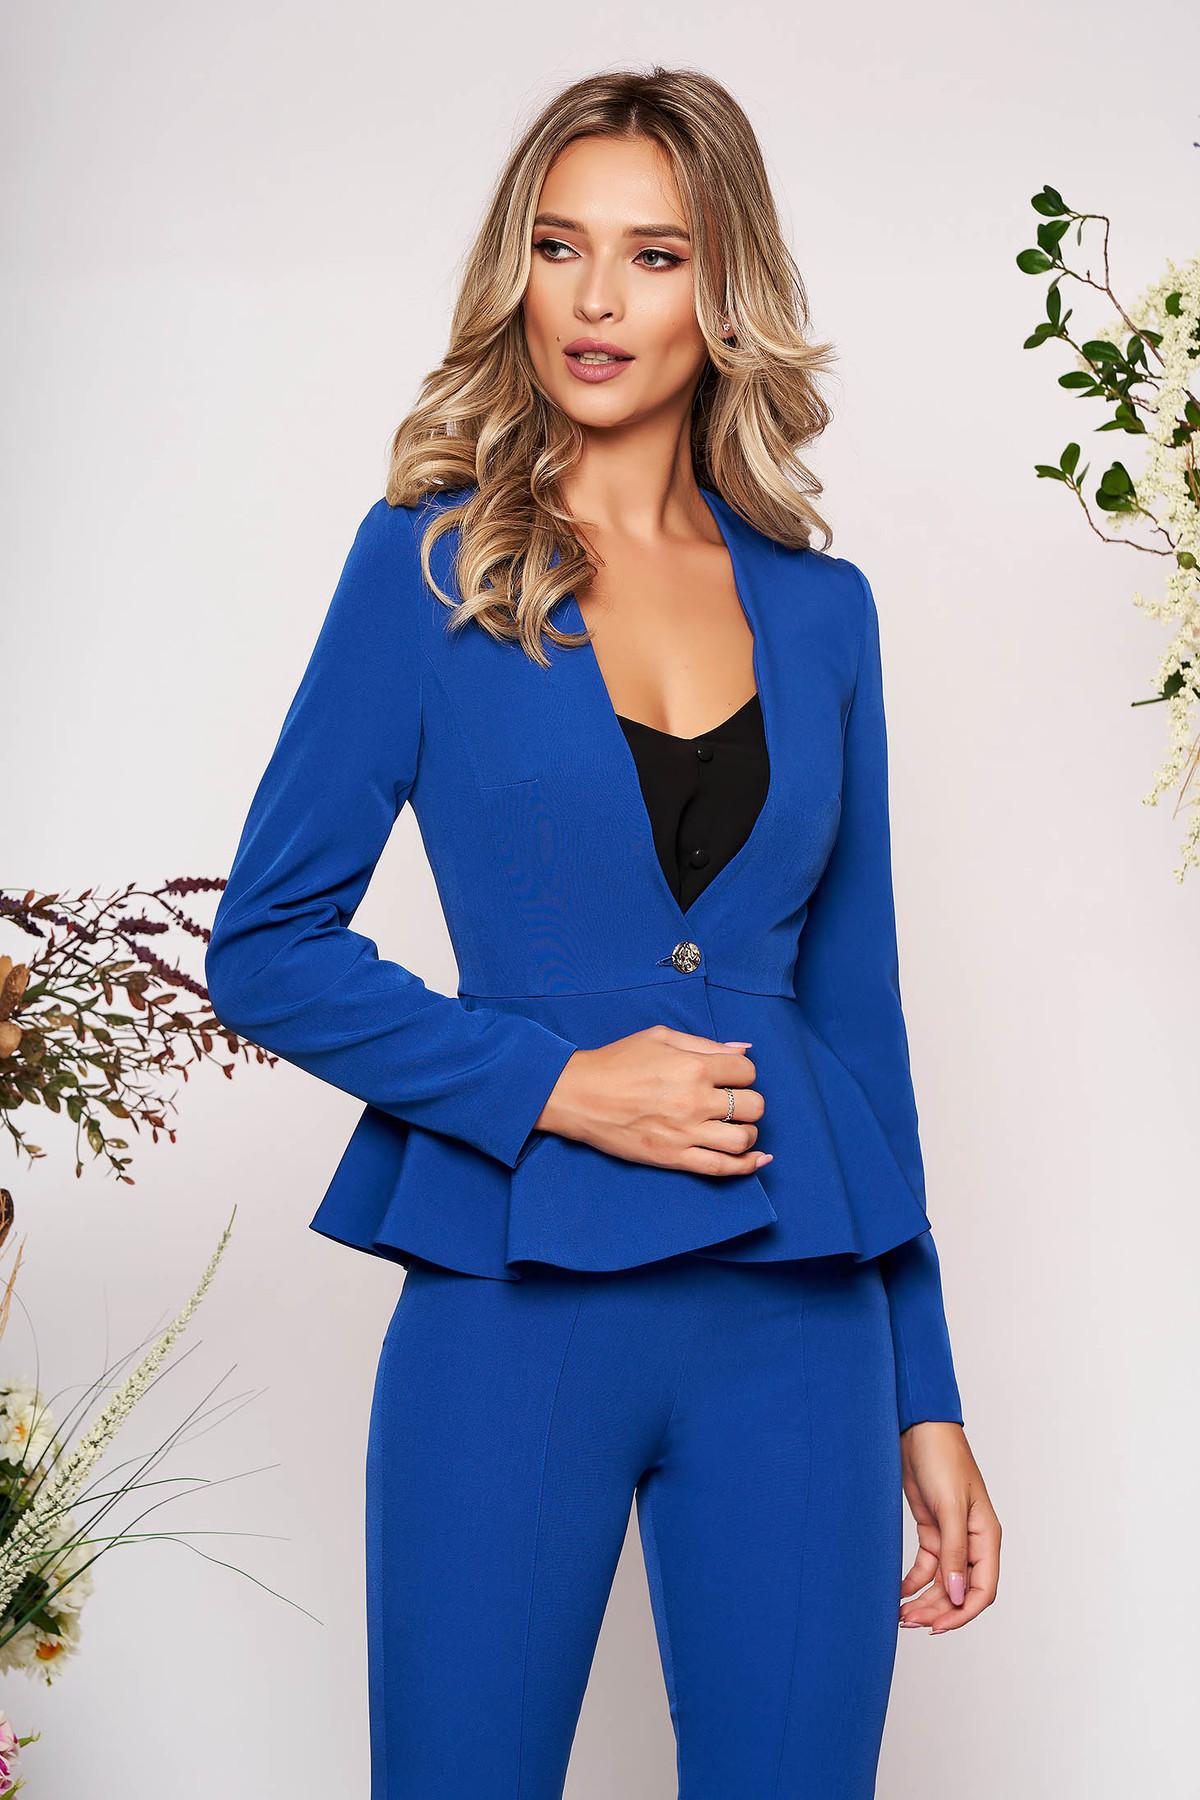 Sacou StarShinerS albastru elegant scurt din stofa elastica cu peplum cu maneci lungi si captusit pe interior